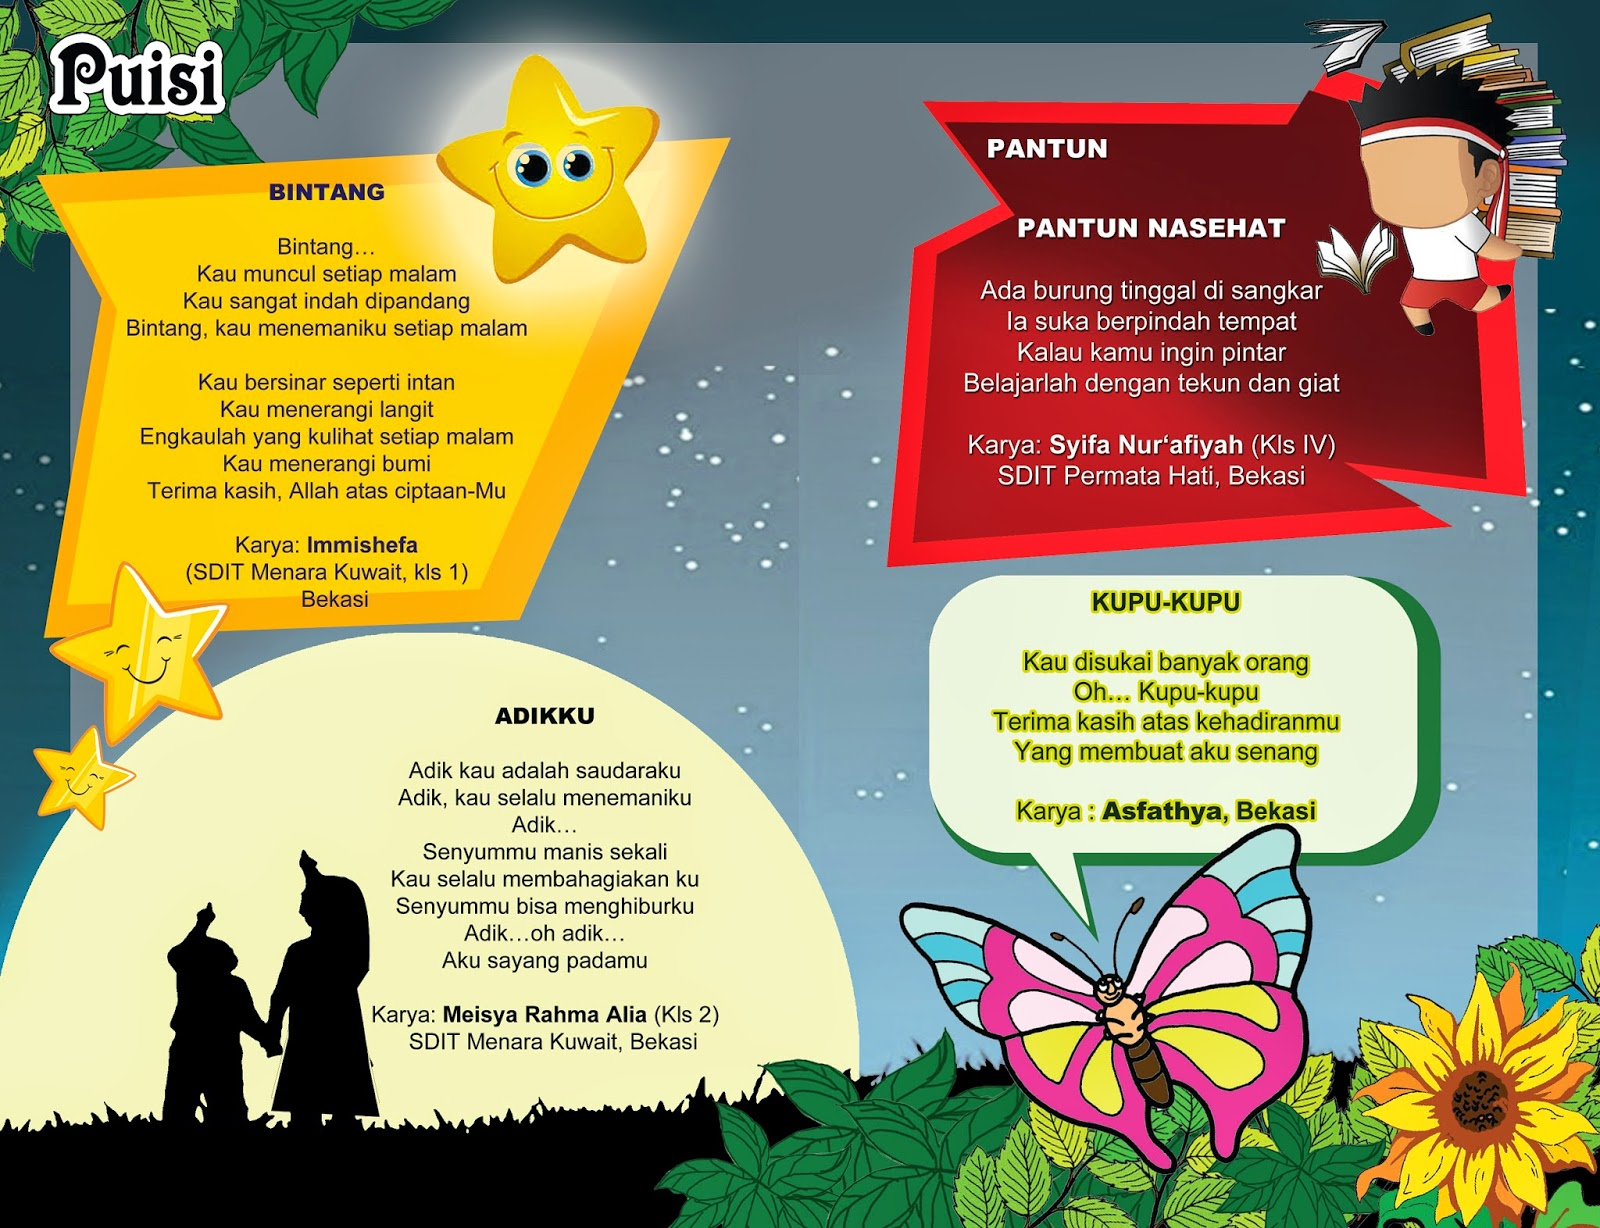 Karya Puisi Majalah Sahabat Perdana   Majalah Anak SAHABAT